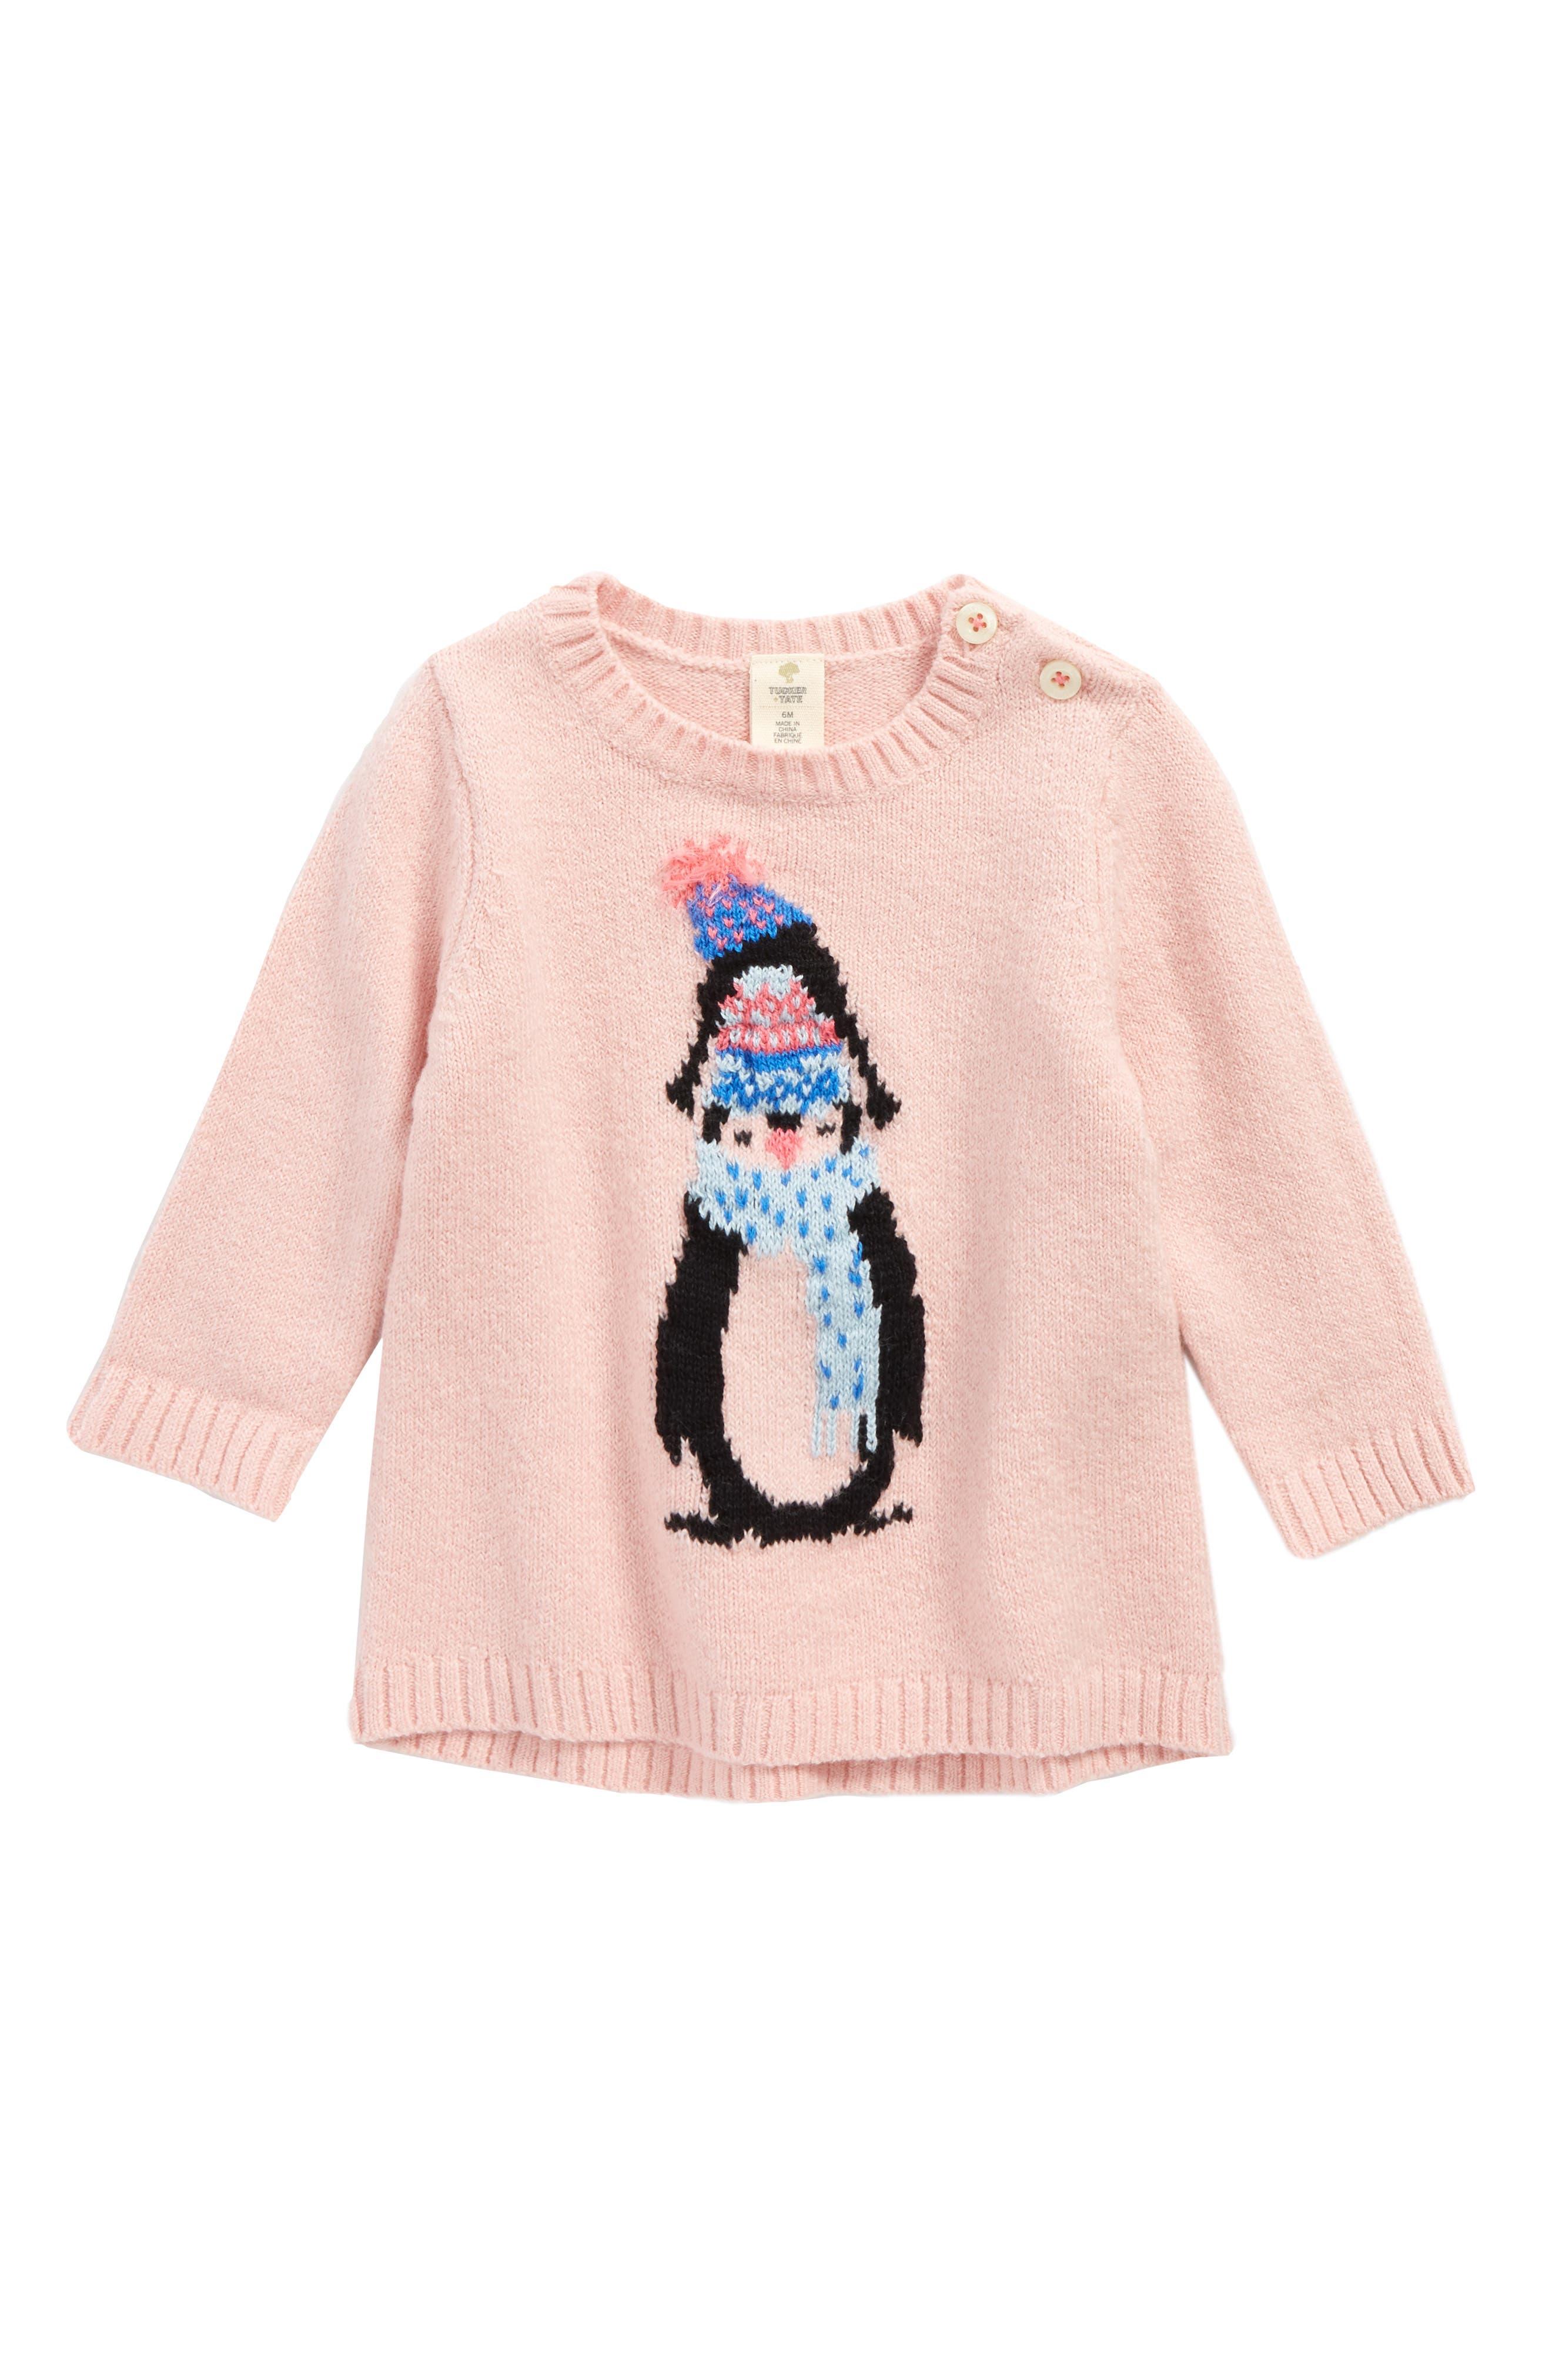 Penguin Sweater,                             Main thumbnail 1, color,                             680